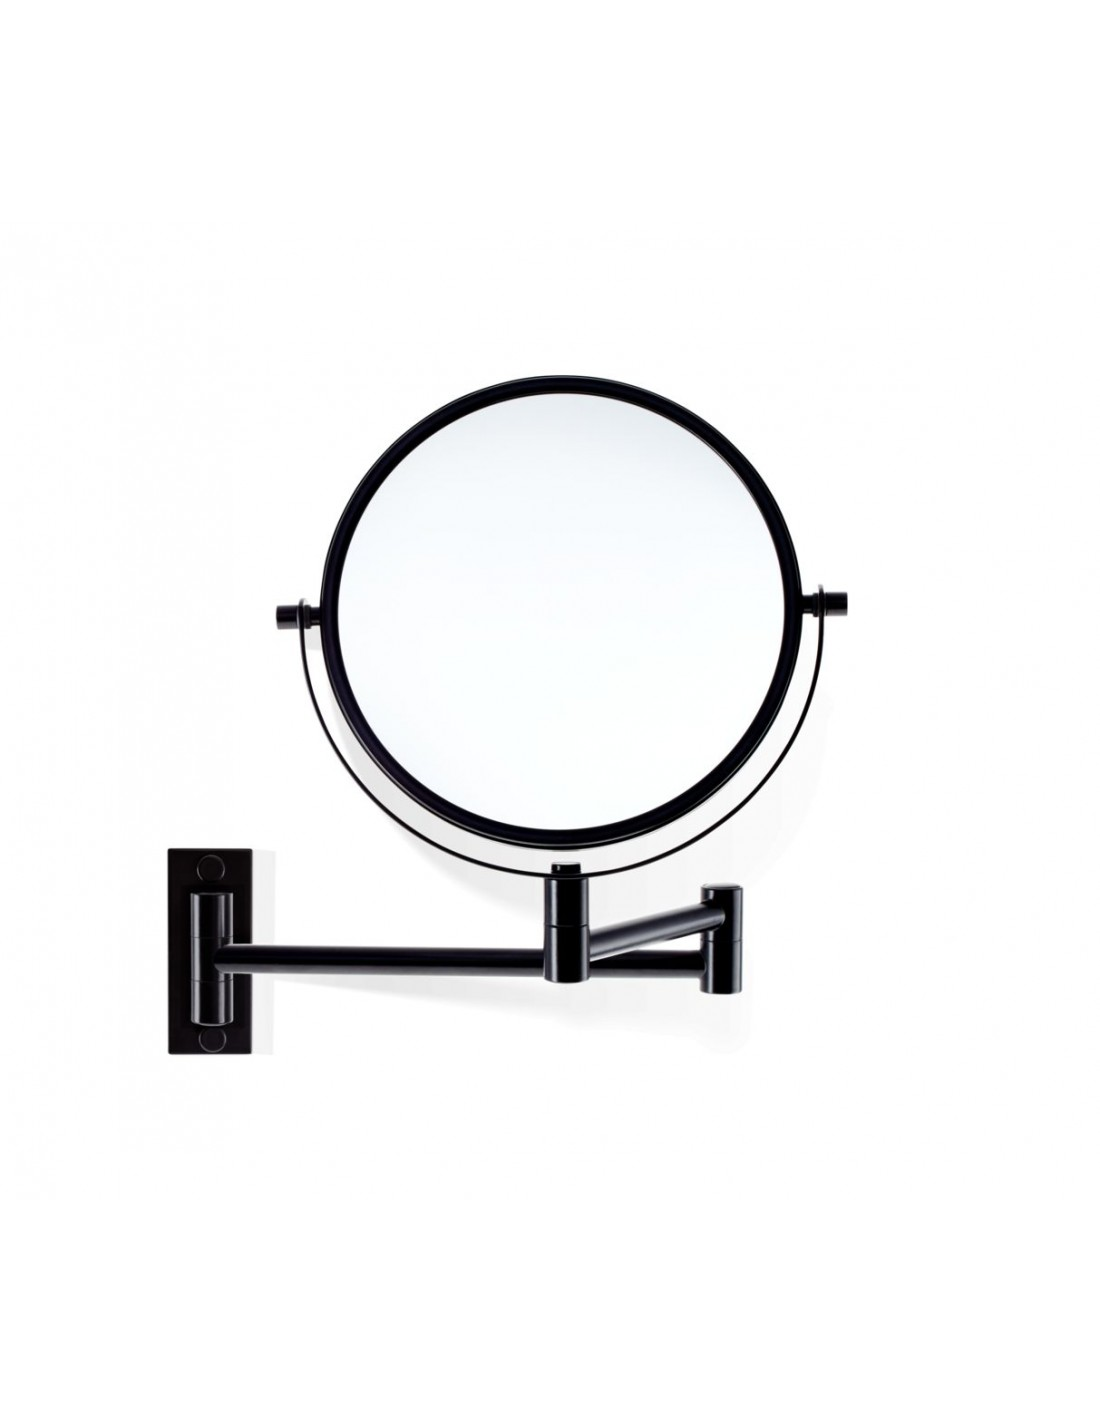 Miroir grossissant mural x 5 SPT 33 noir mat vue de face Decor Walther - Valente Design